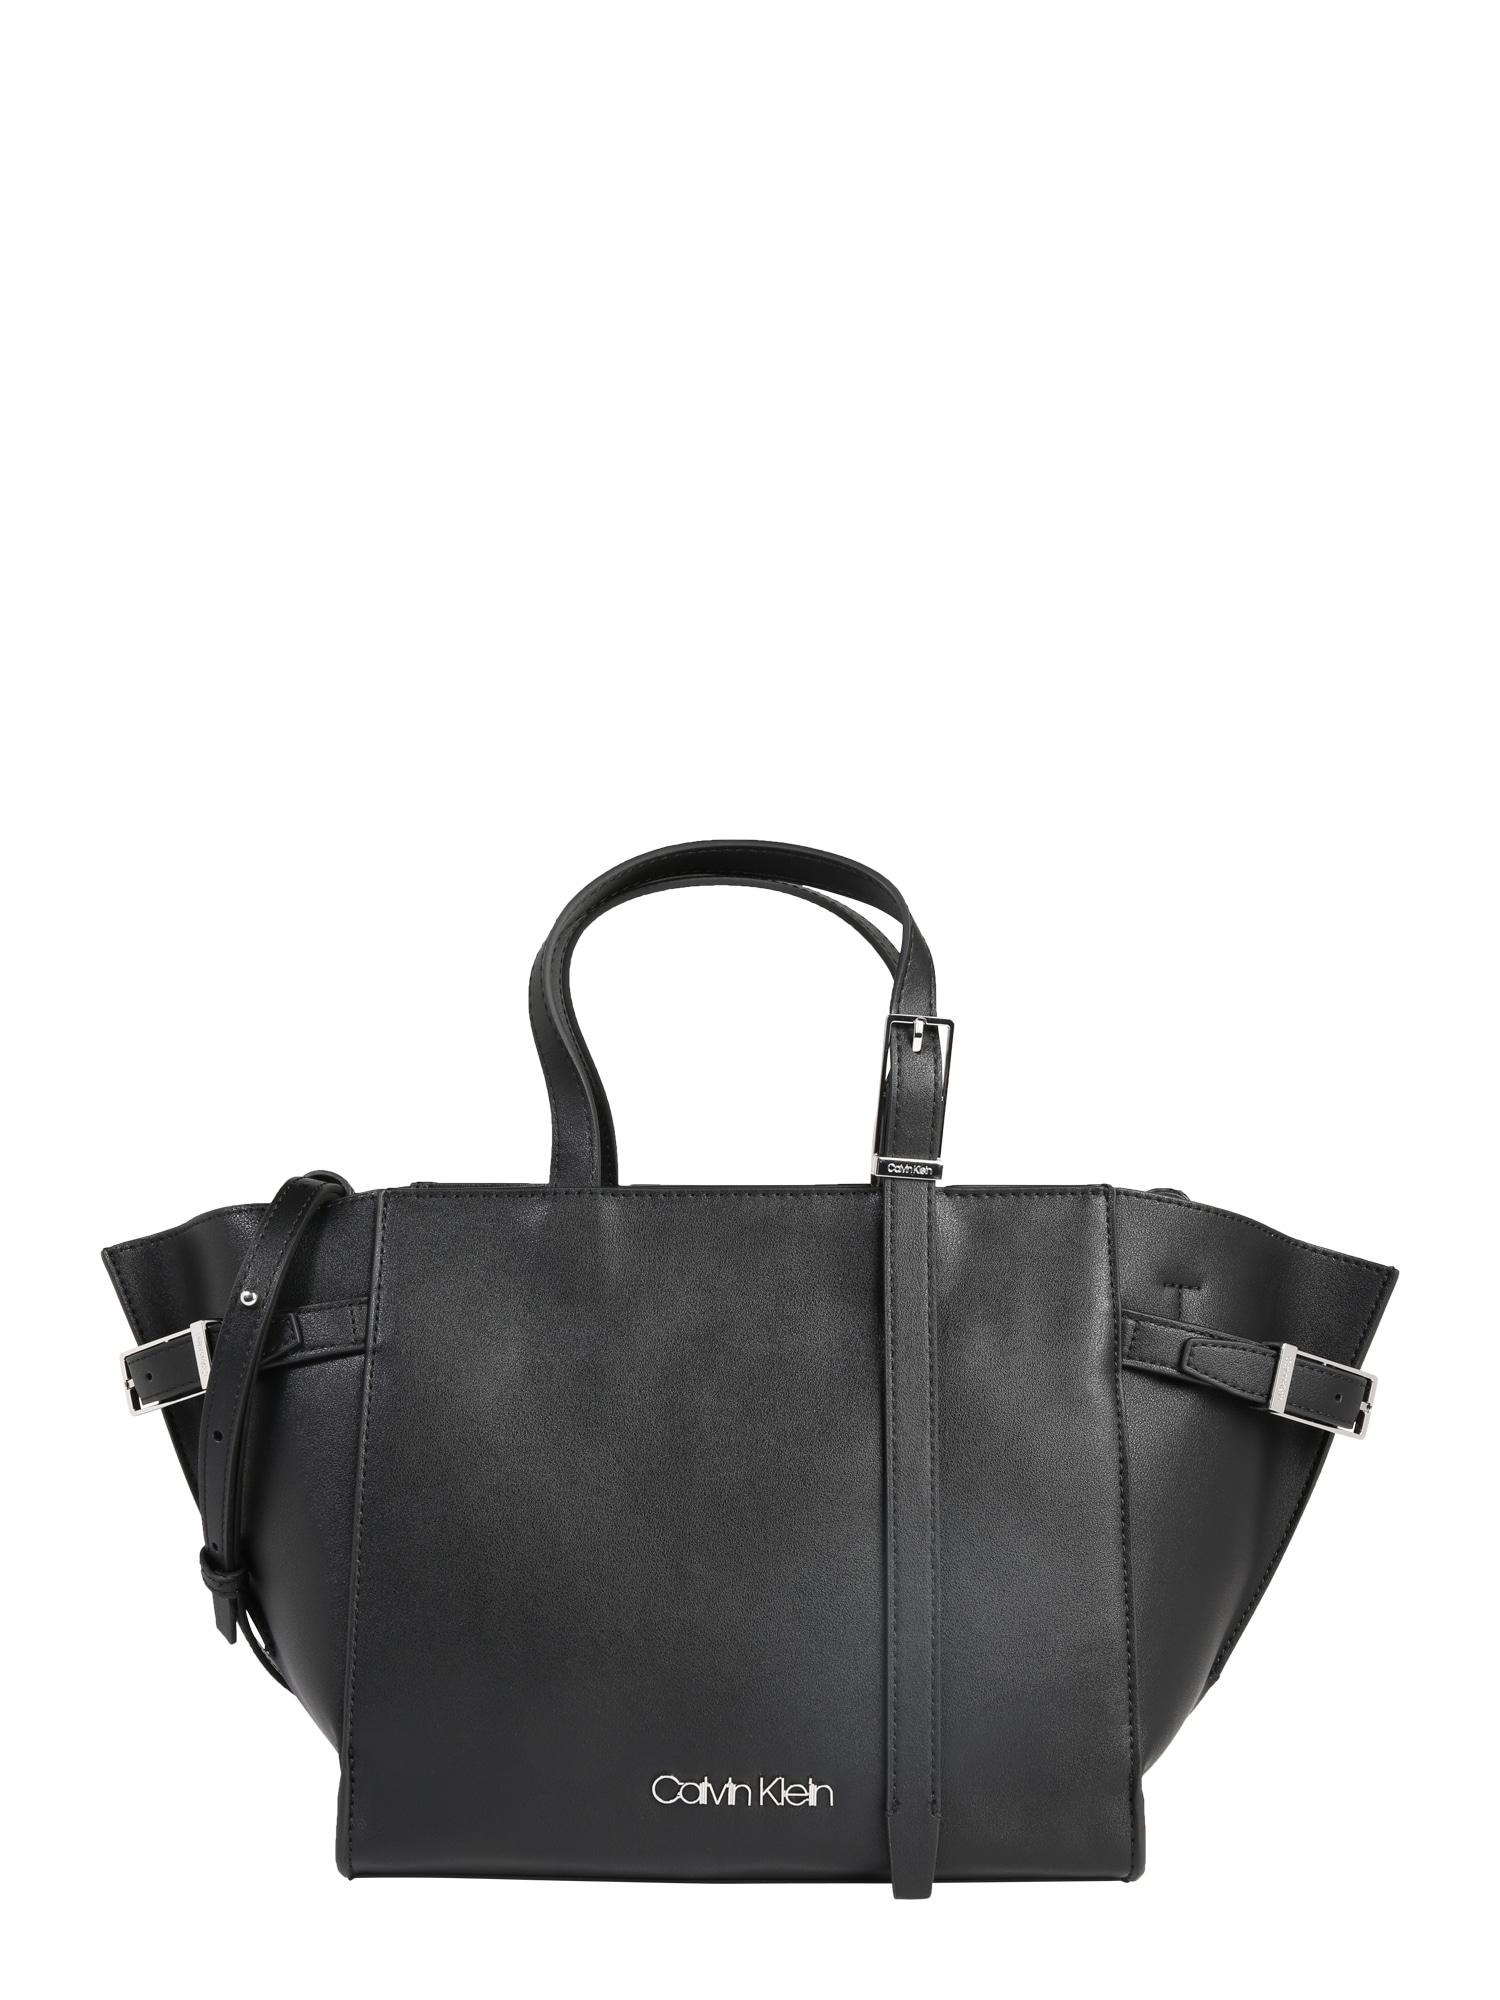 Taška přes rameno EXTENDED TOTE černá Calvin Klein